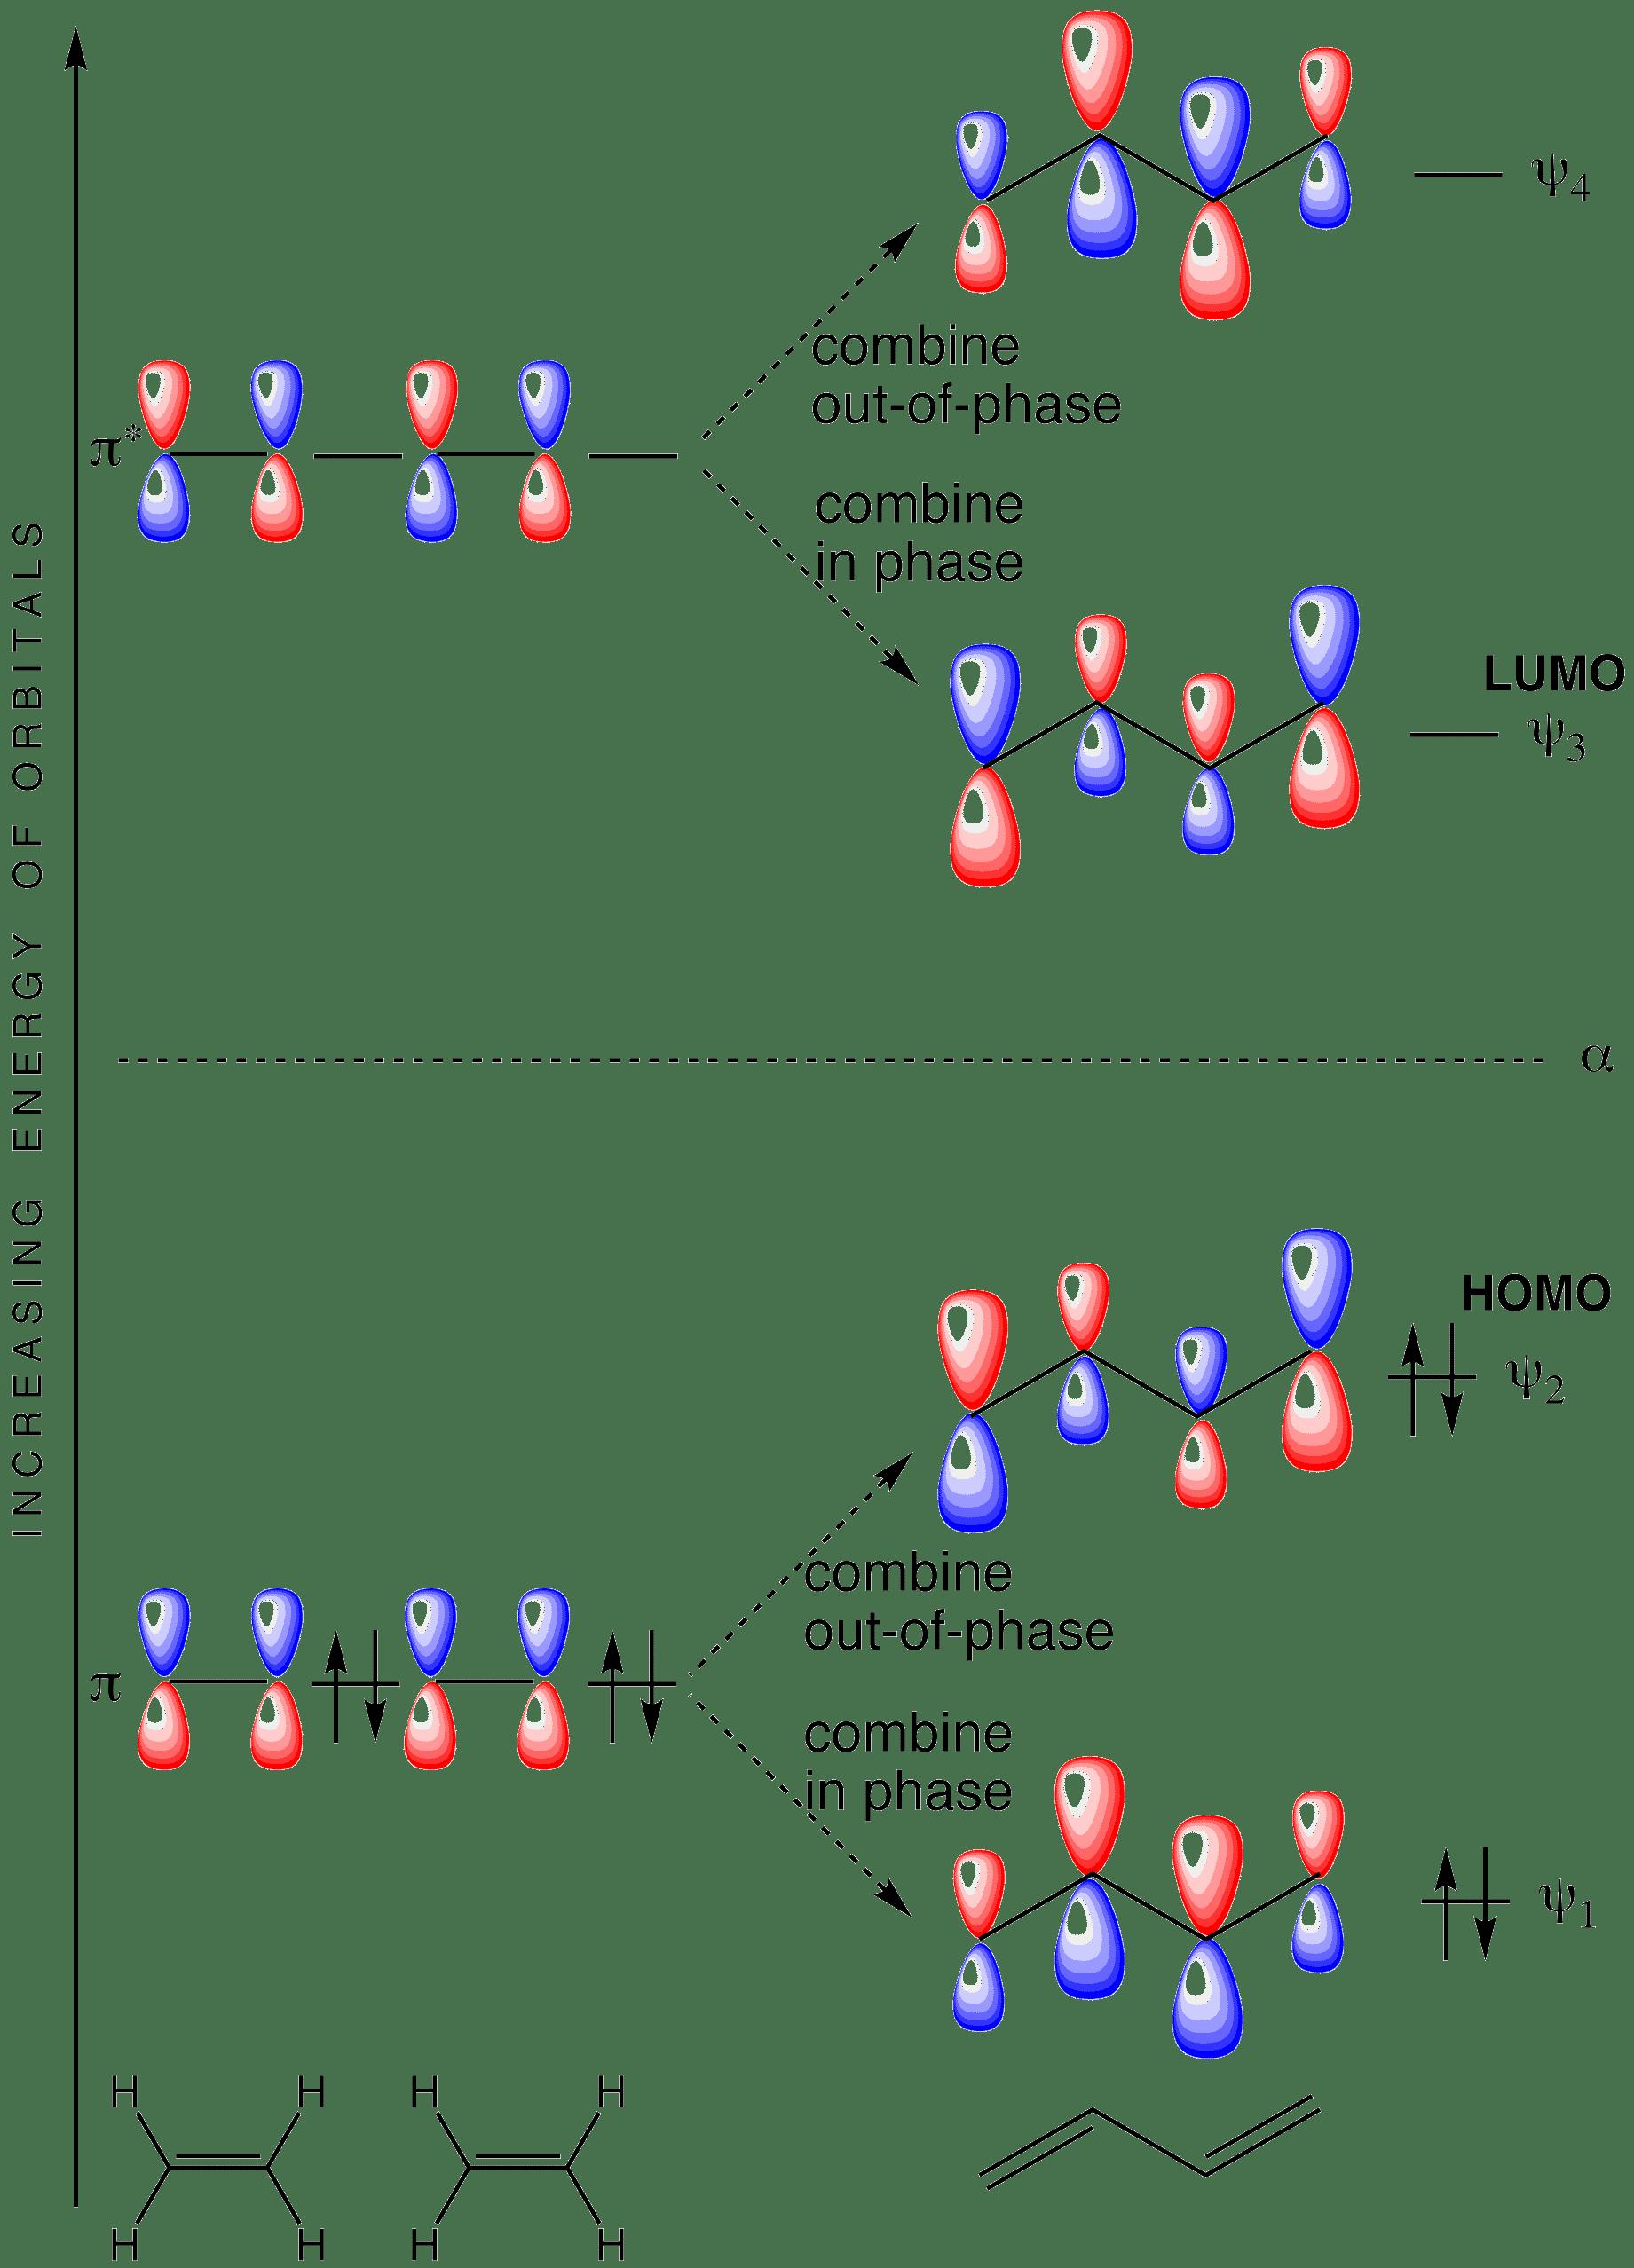 butadieneorbitals_n π molecular orbitals of conjugated butadiene